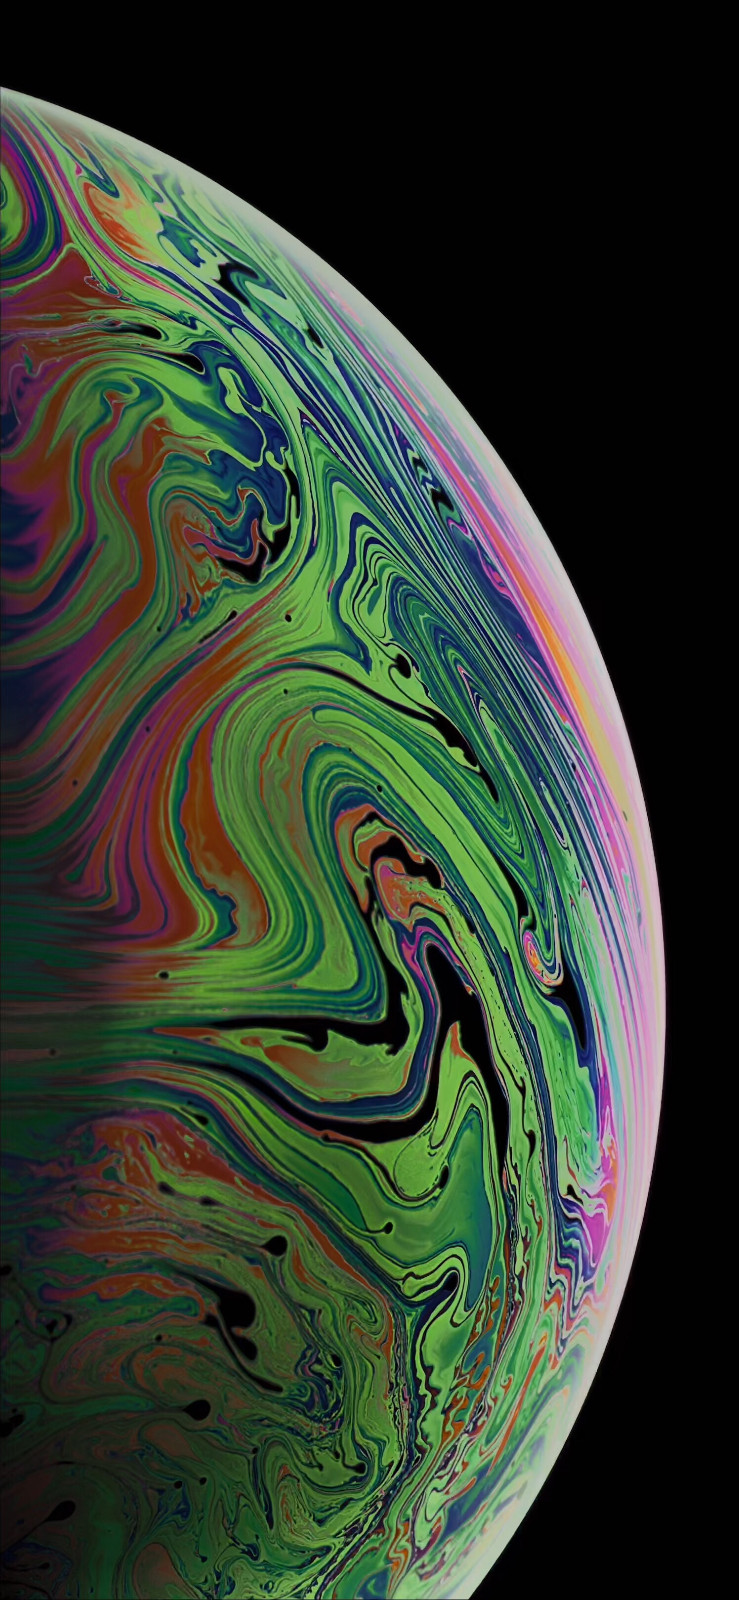 iPhone XS新增气泡壁纸下载:静态、动态都有